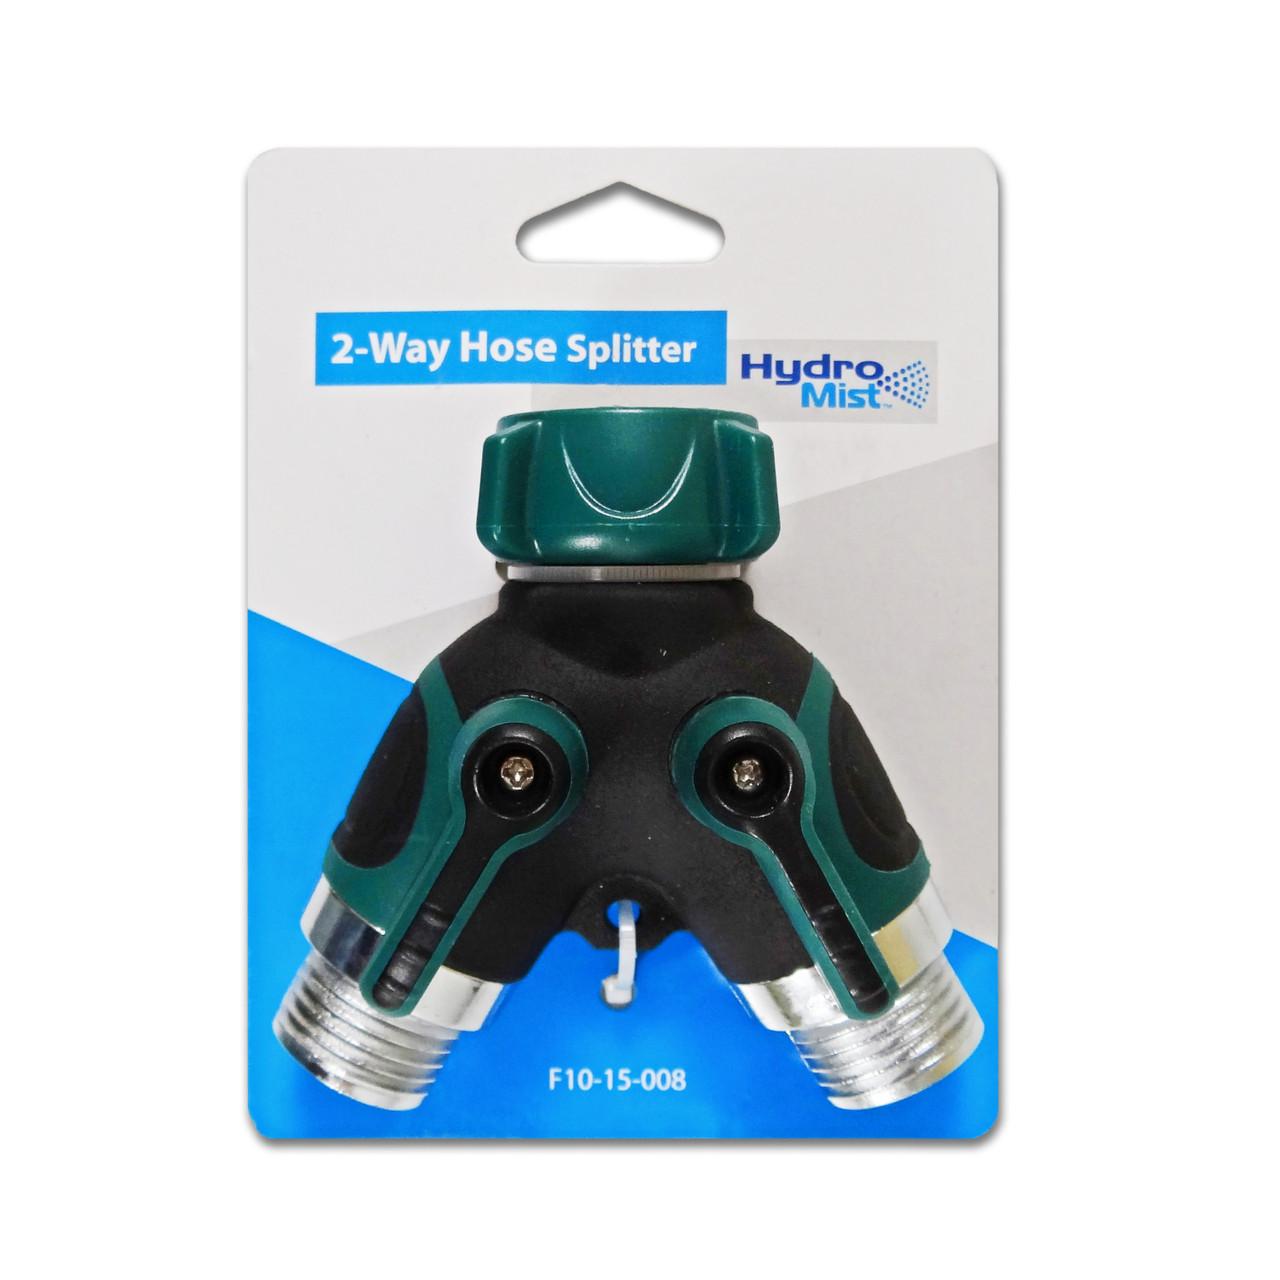 2-Way Hose Splitter